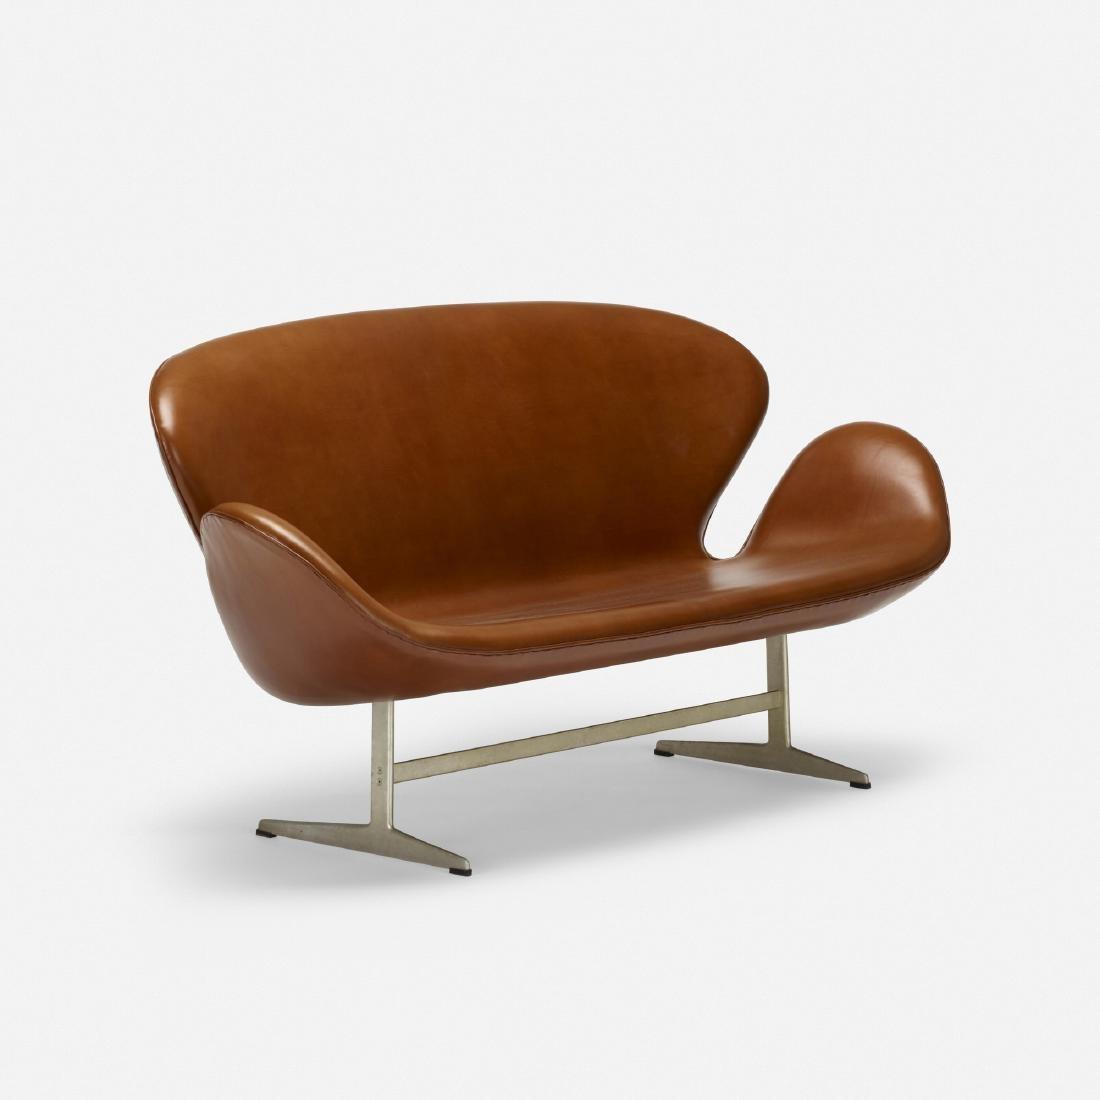 Arne Jacobsen, Swan settee, model 3321 - 2